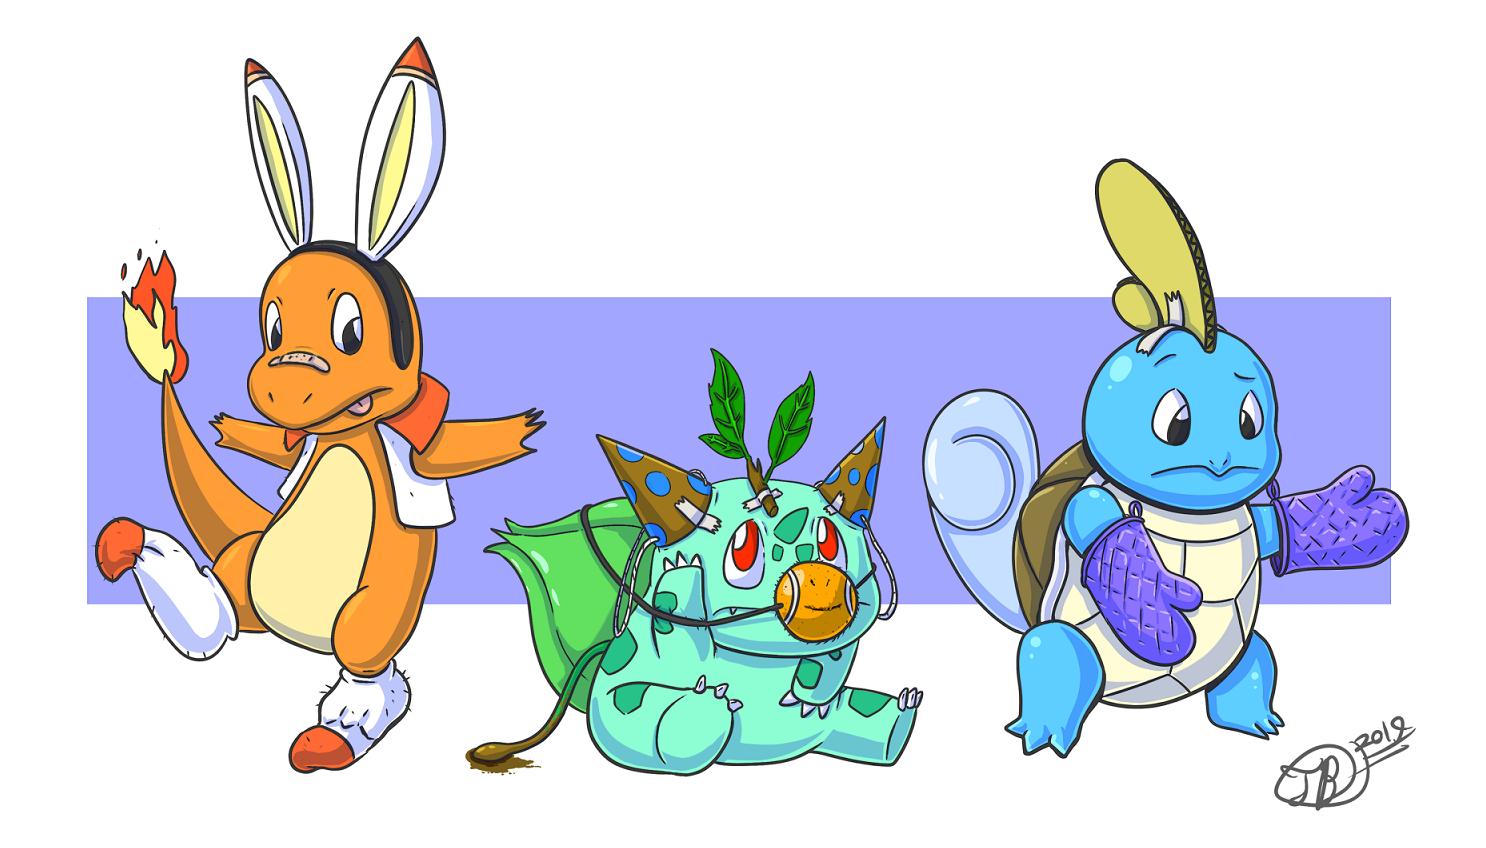 So...heard there were new starter Pokemon